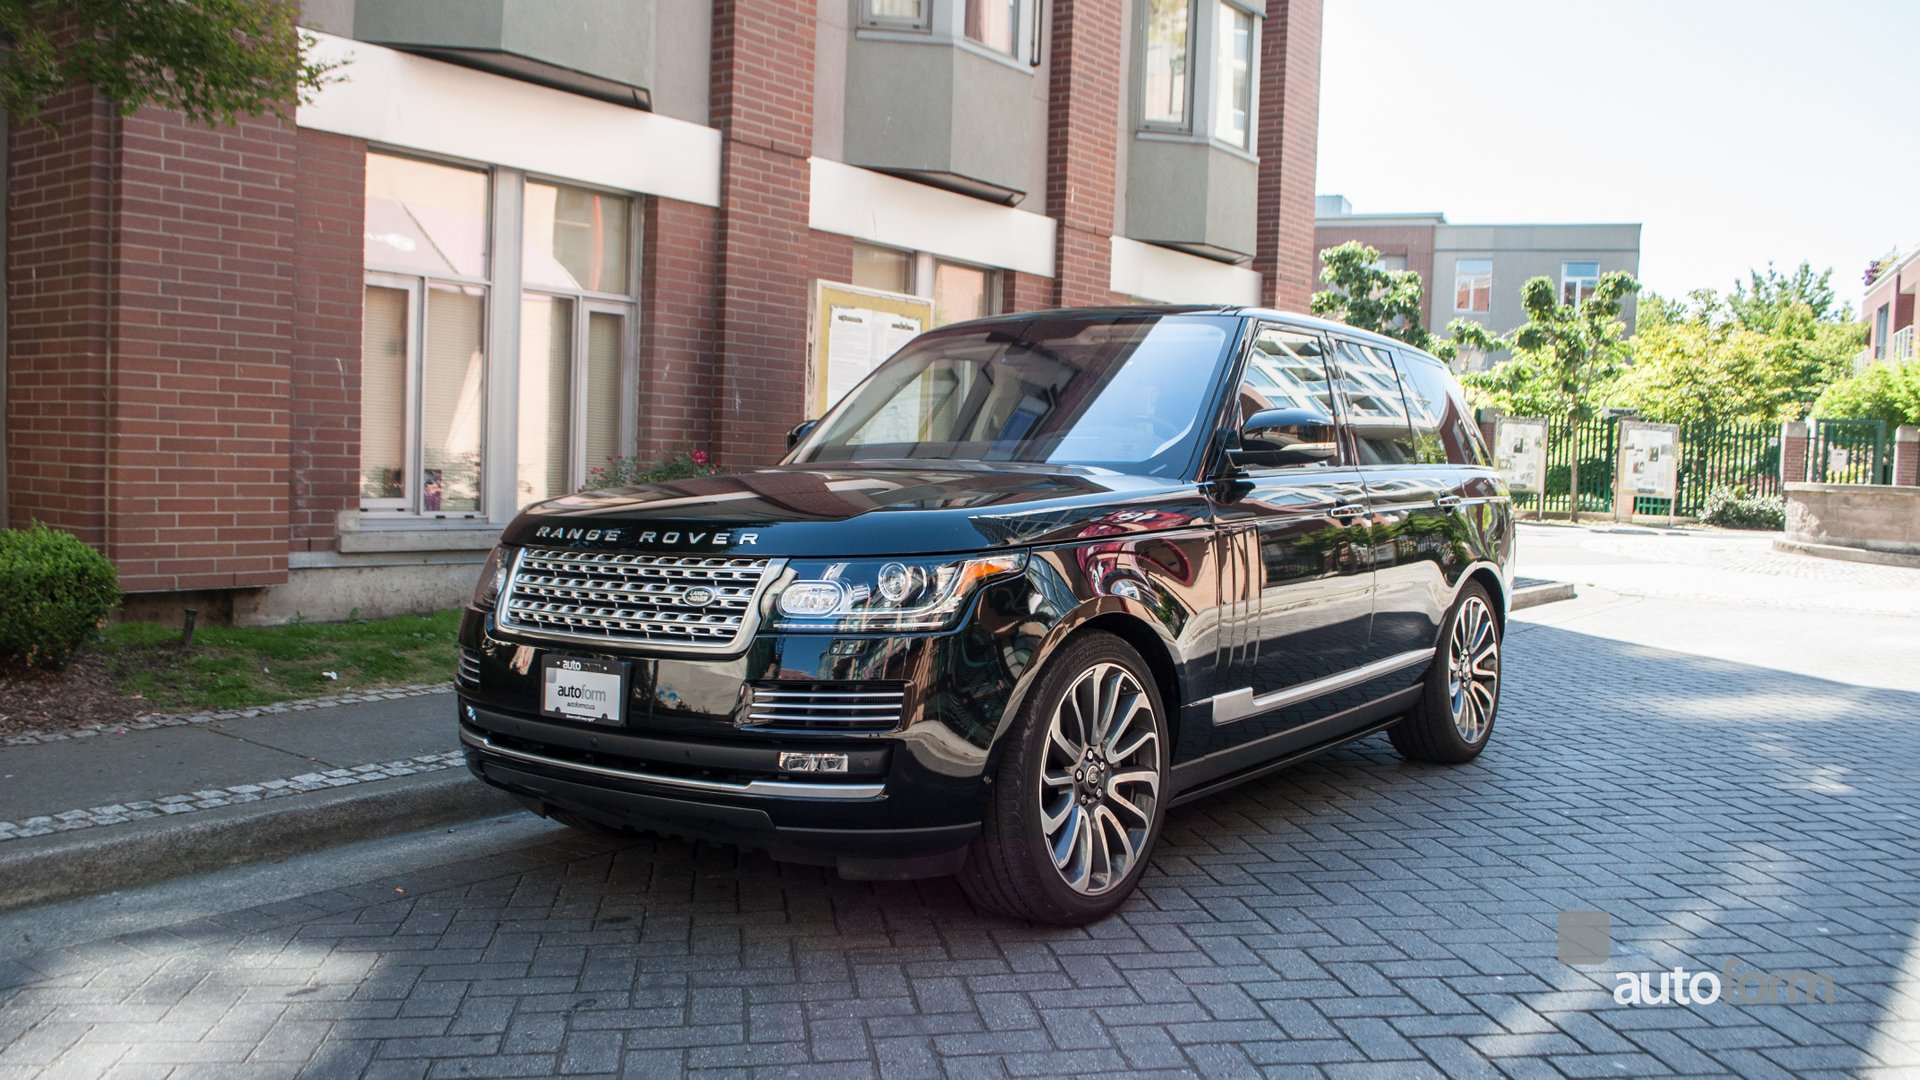 Range Rover Autobiography 2016 >> 2016 Land Rover Range Rover Autobiography Autoform